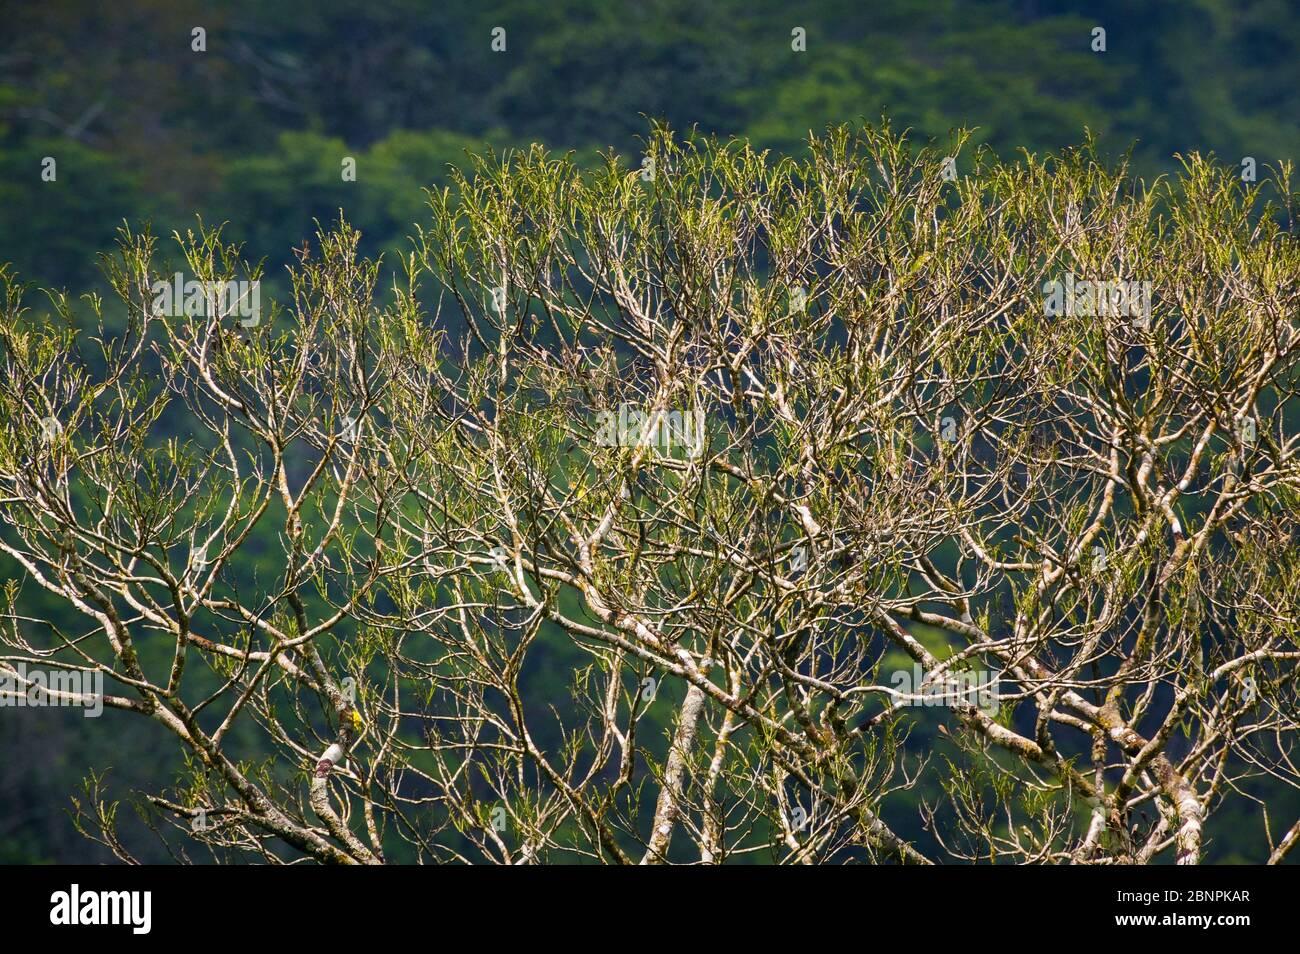 Beautful tree canopy in the rainforest at Cana field station, Darien national park, Darien province, Republic of Panama Stock Photo